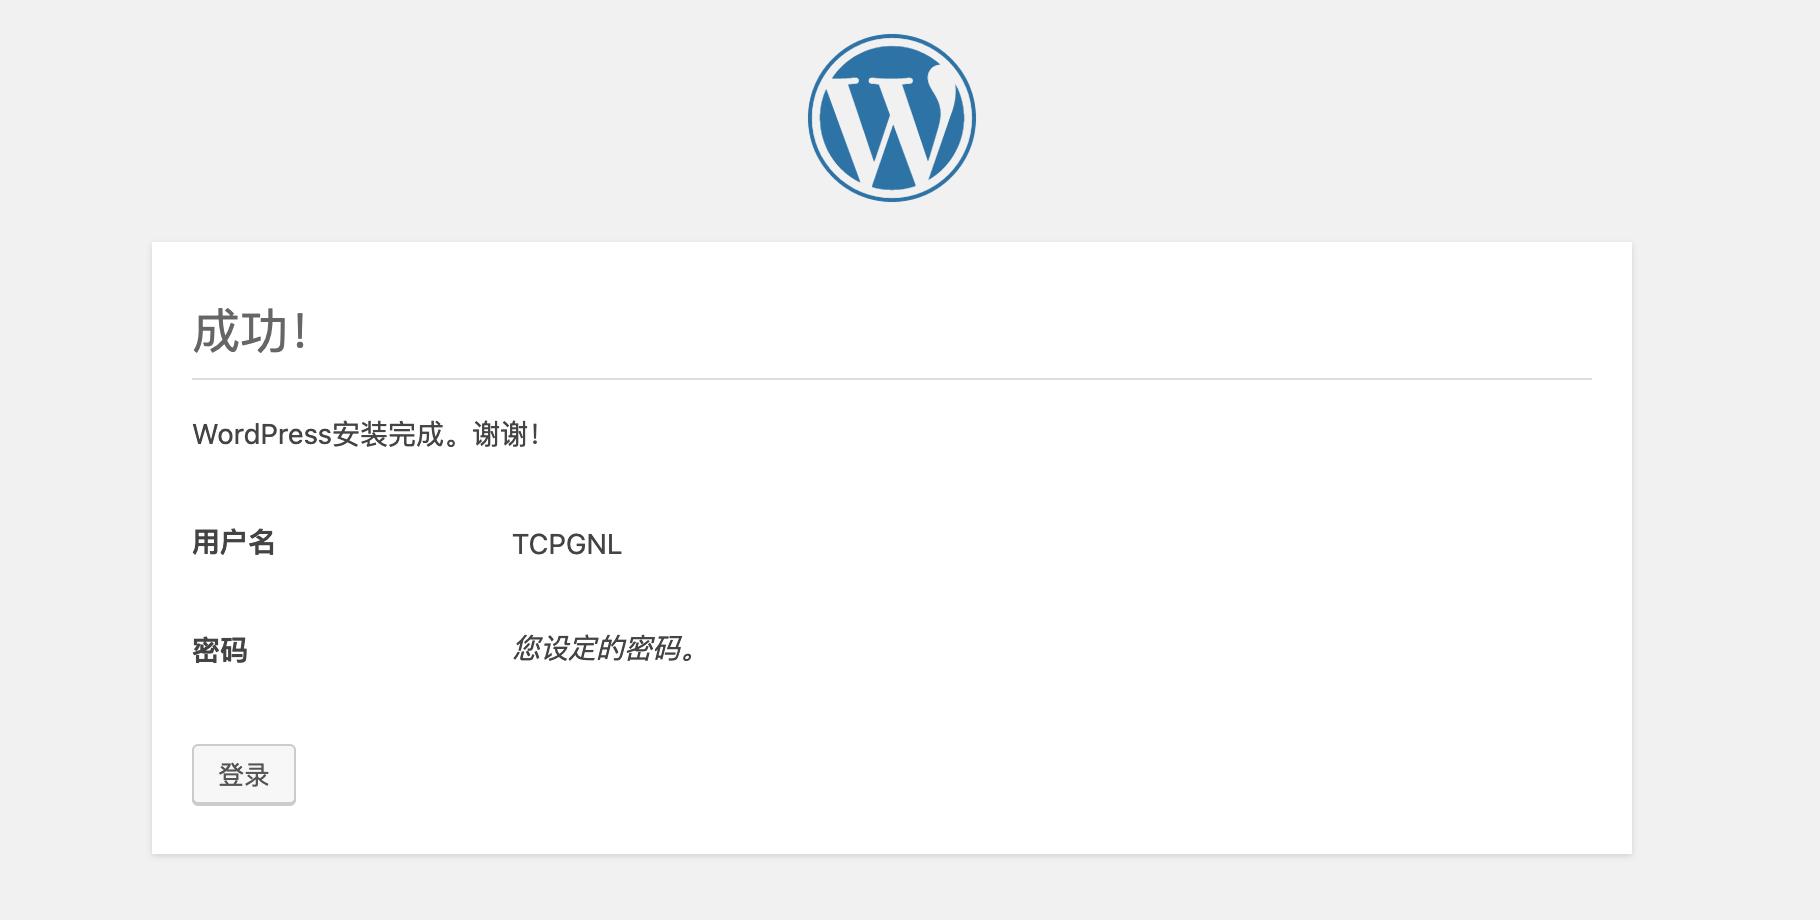 WordPress 安装成功信息